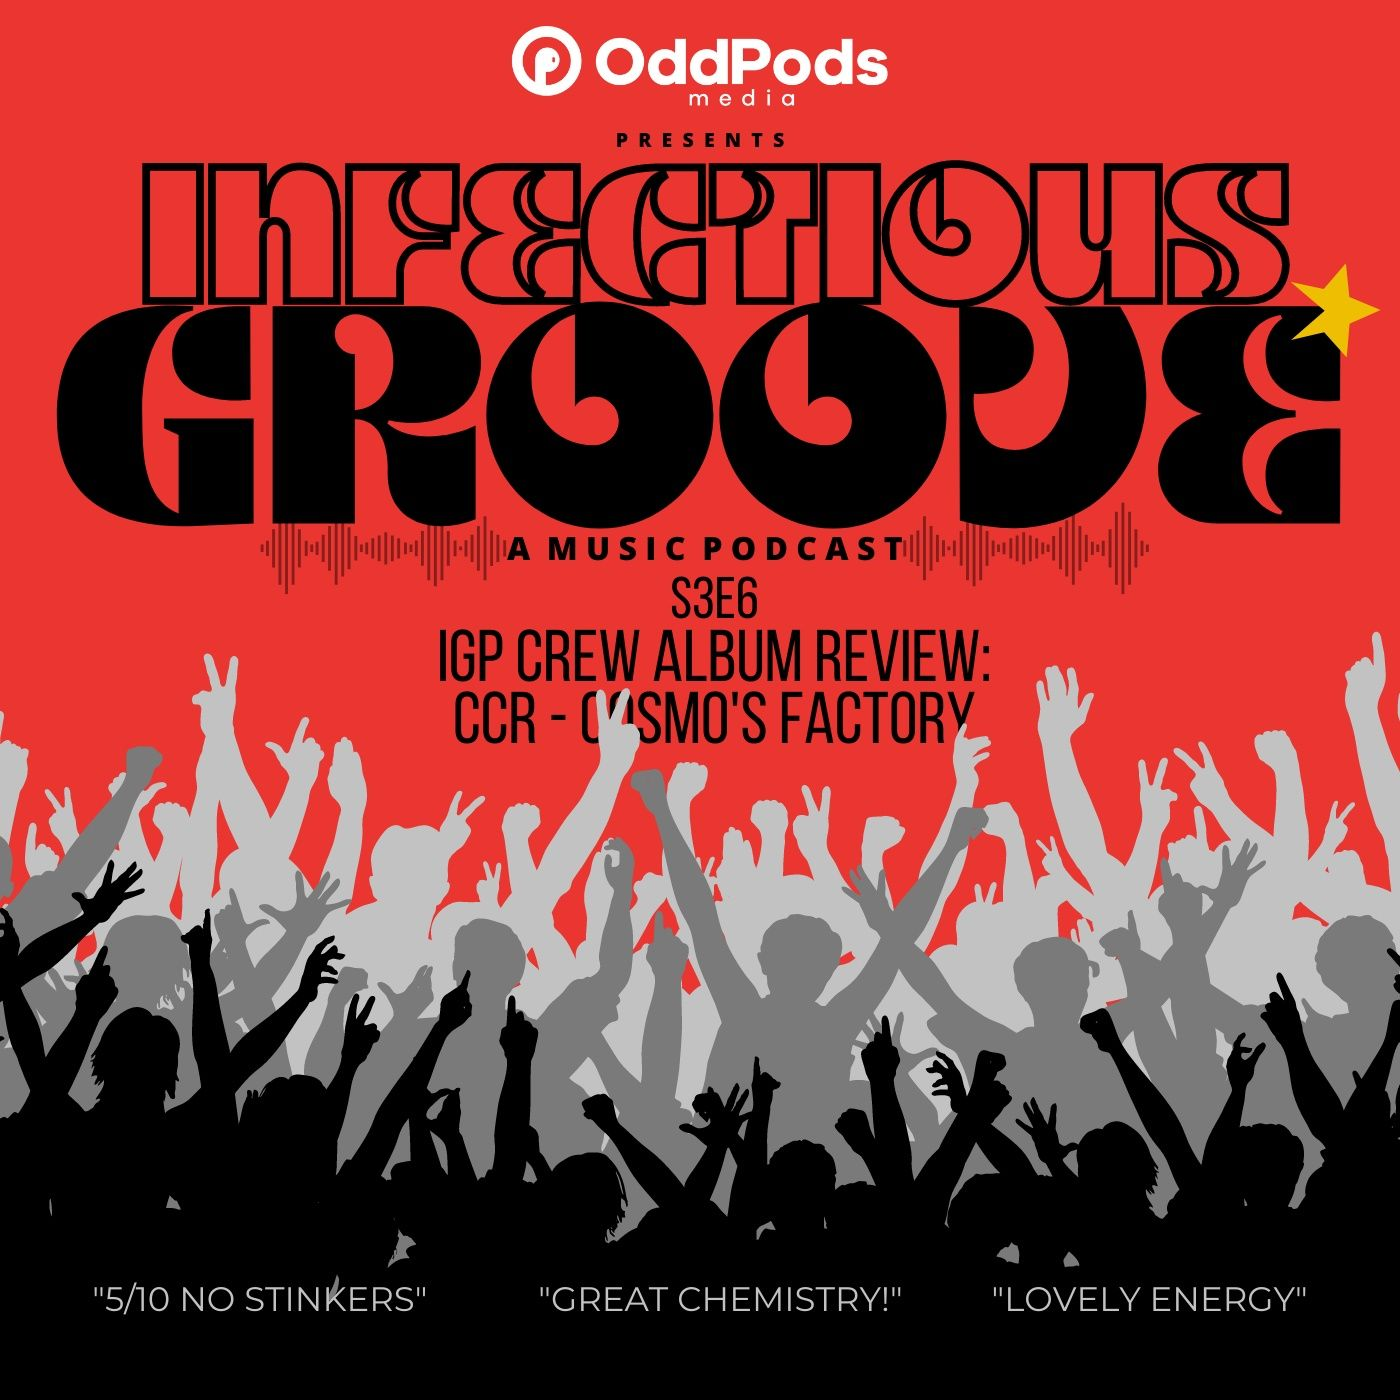 IGP Crew Album Review: CCR - Cosmo's Factory